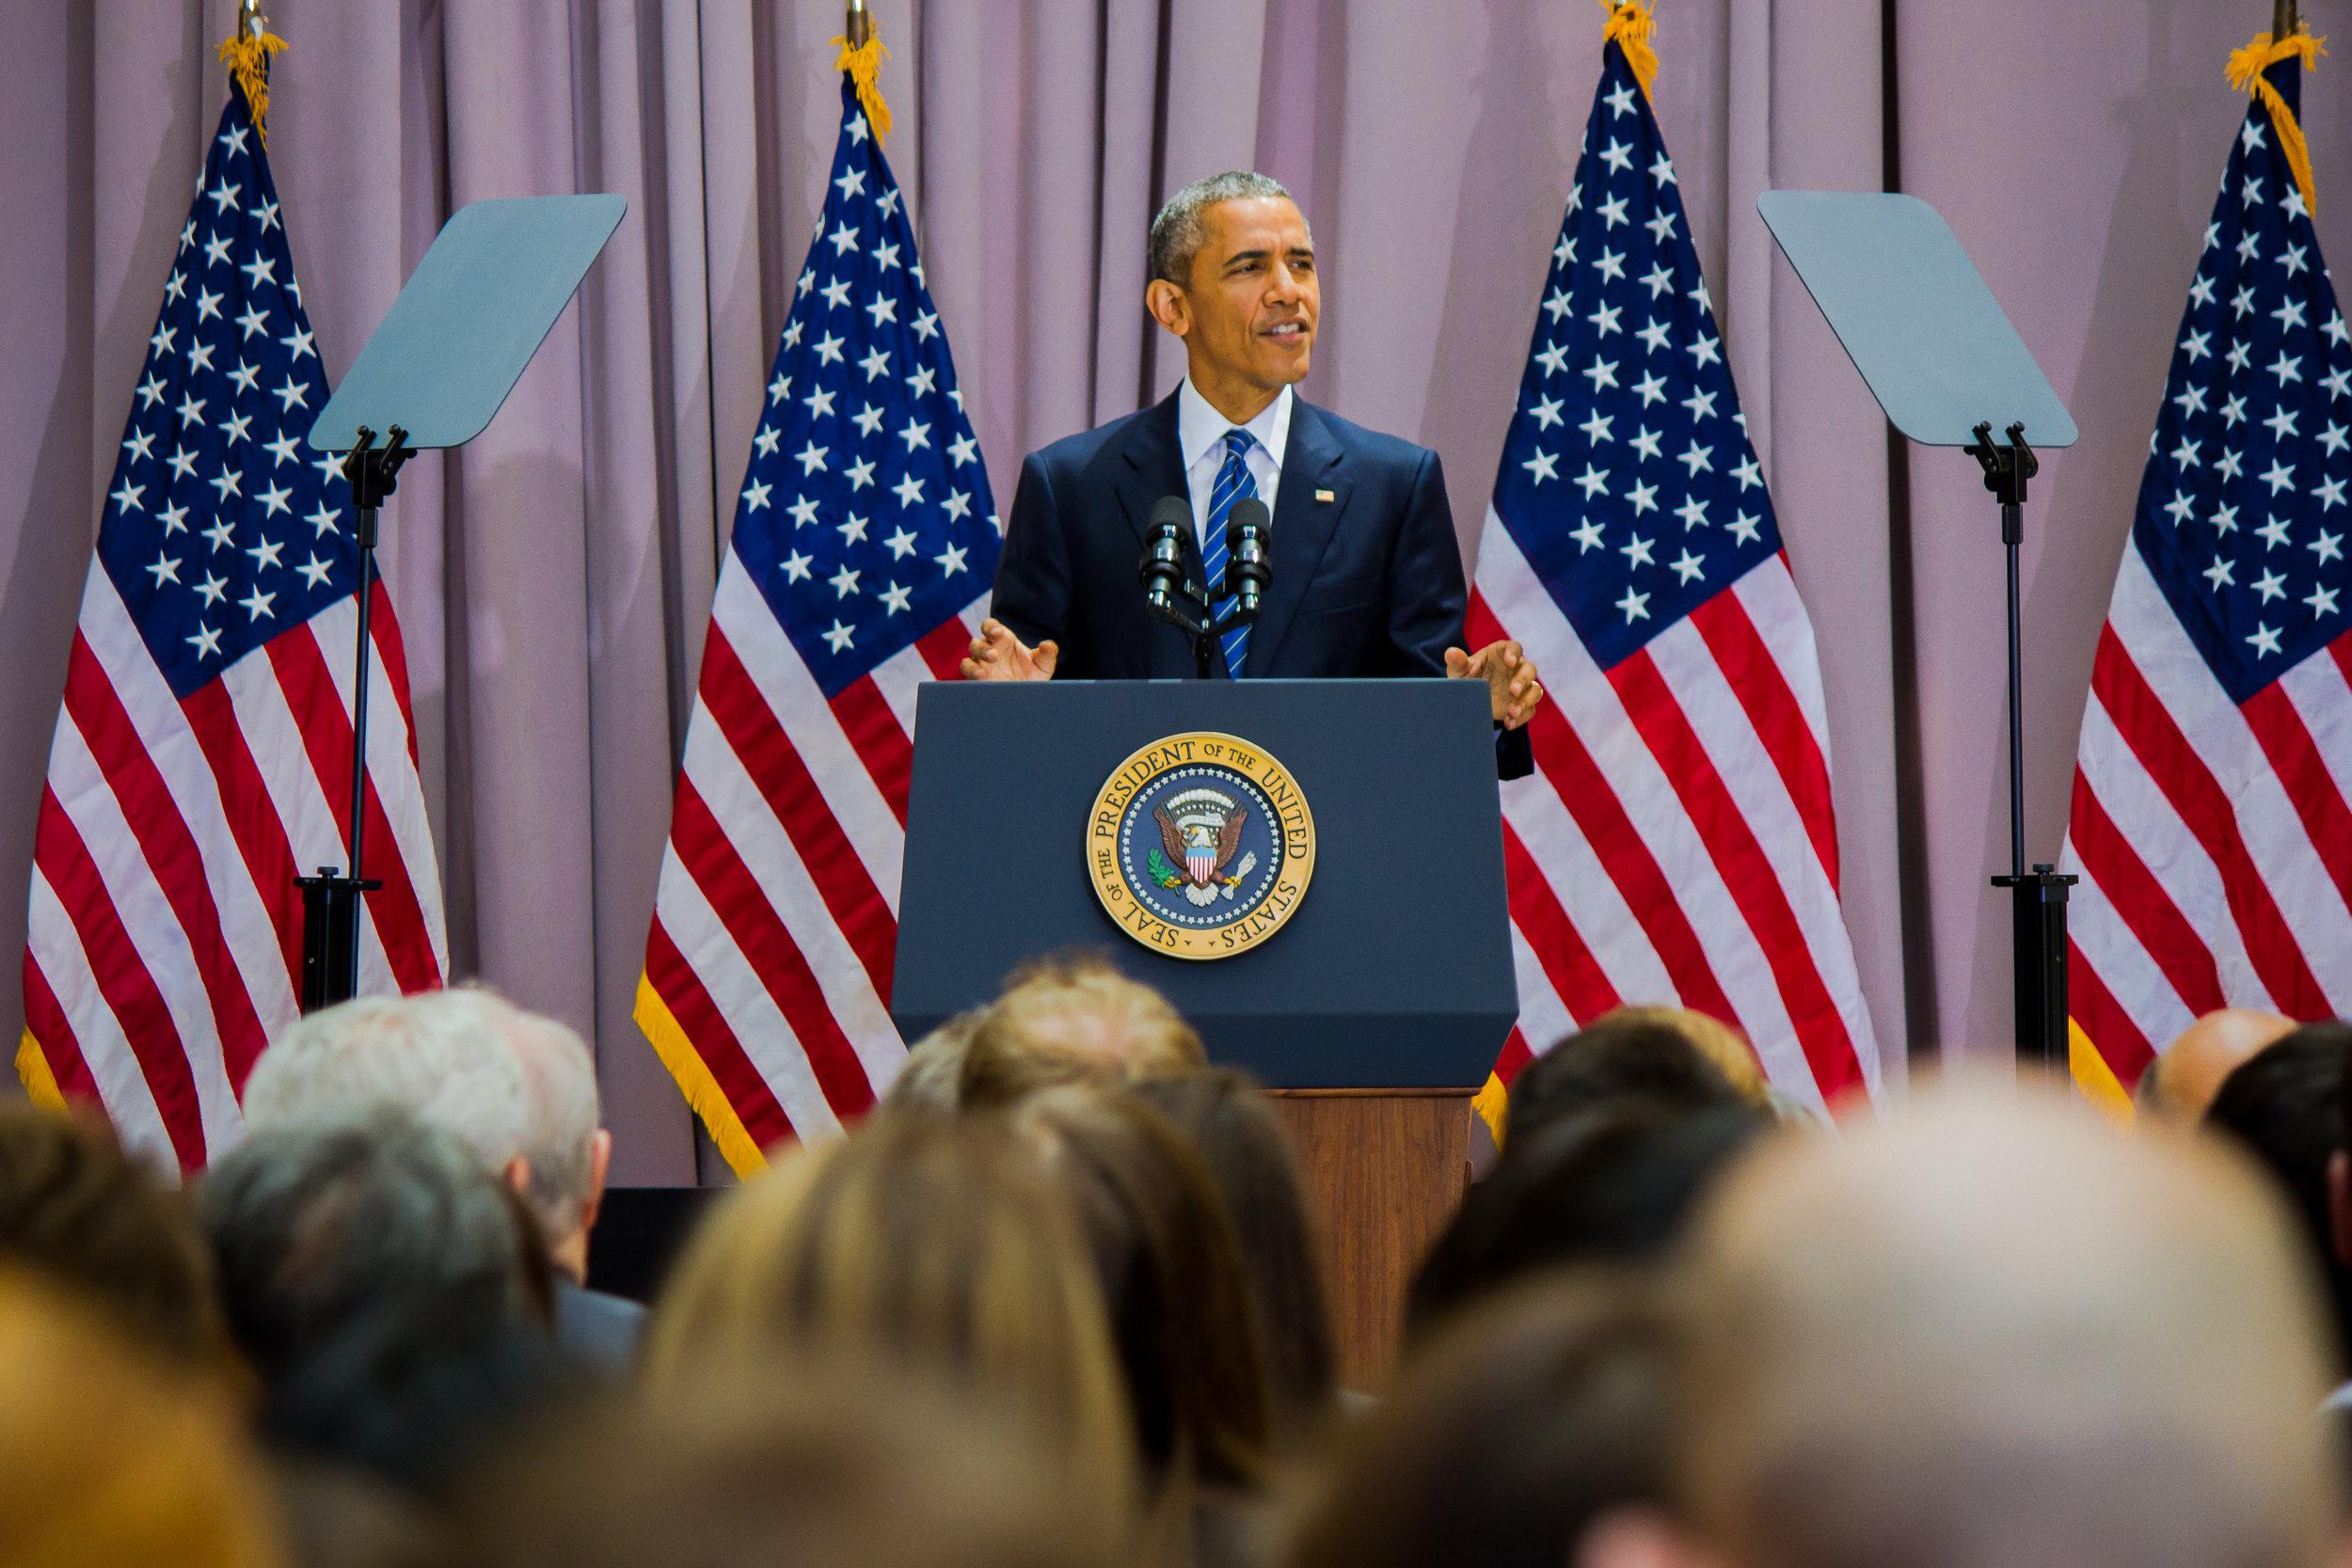 44th   President of the United States  Barack Obama - American University 2015